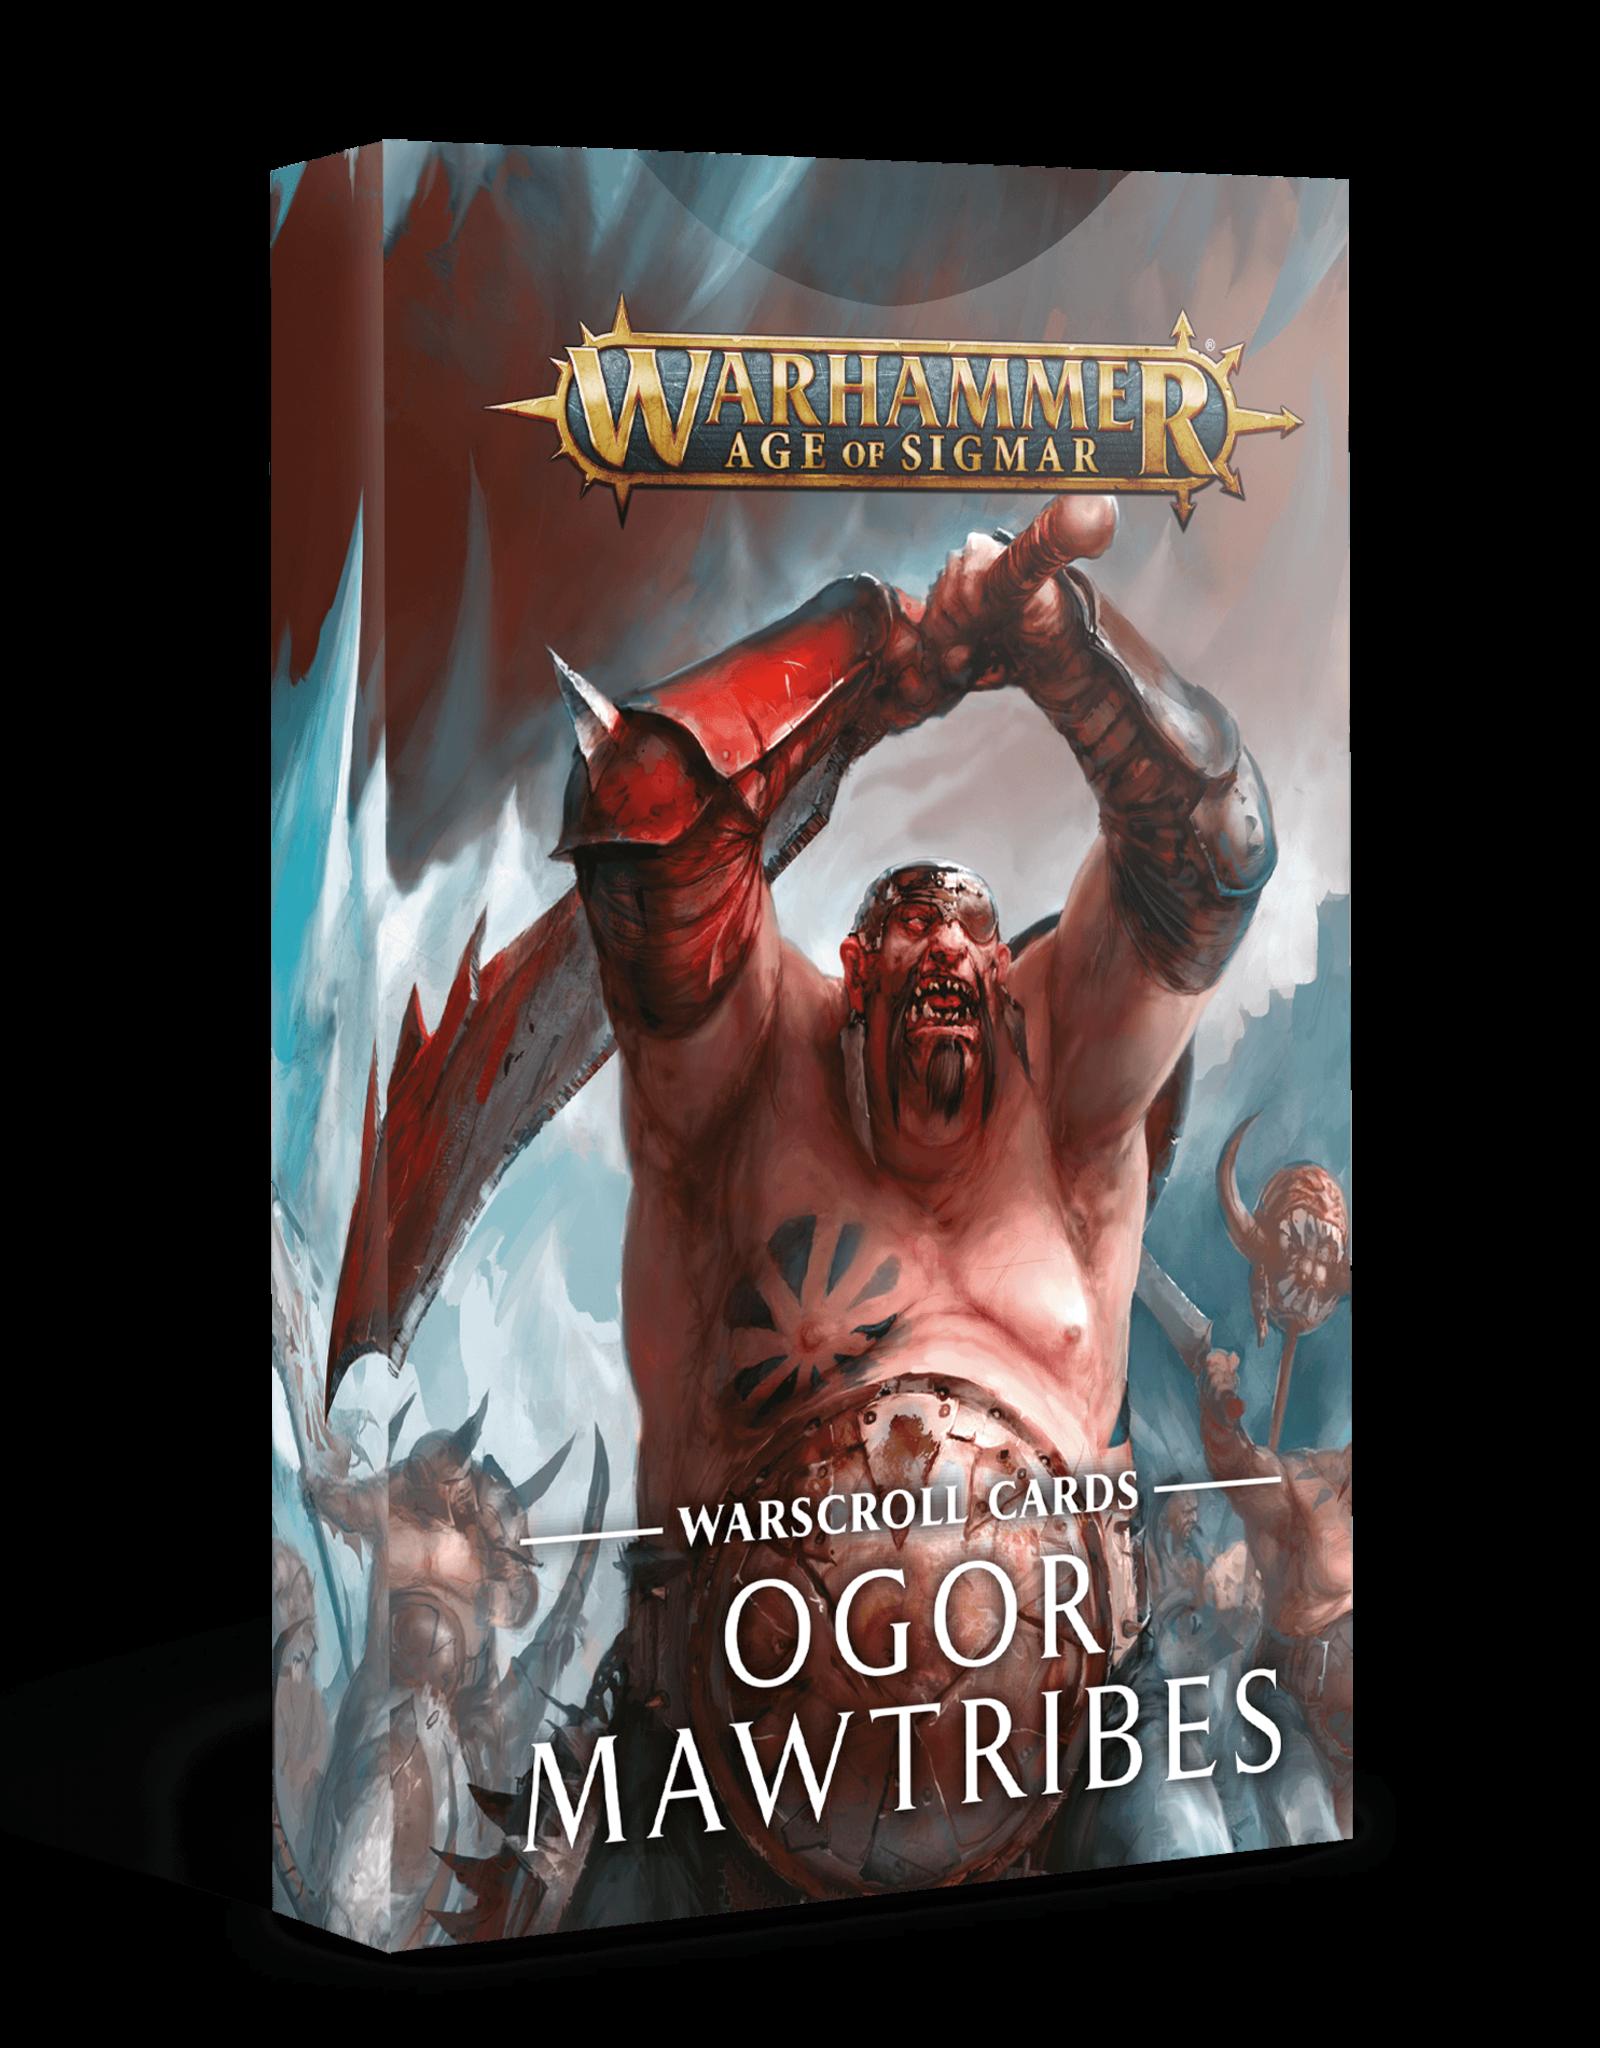 Age of Sigmar Warscroll Cards: Ogor Mawtribes